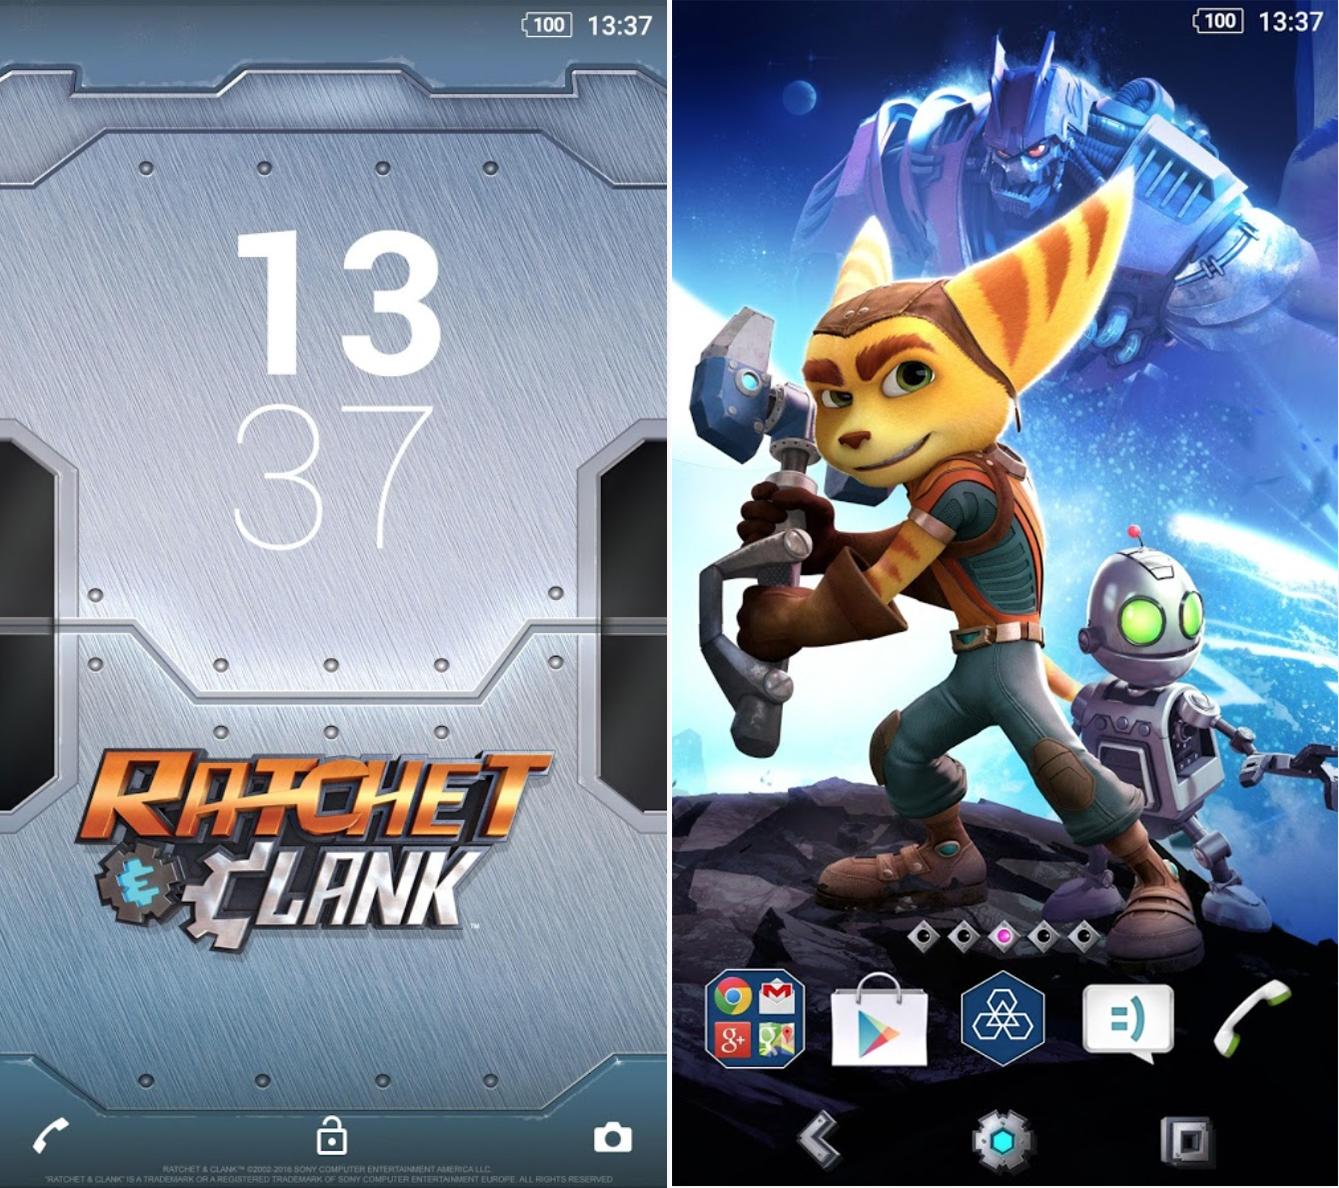 Xperia Ratchet & Clank Theme